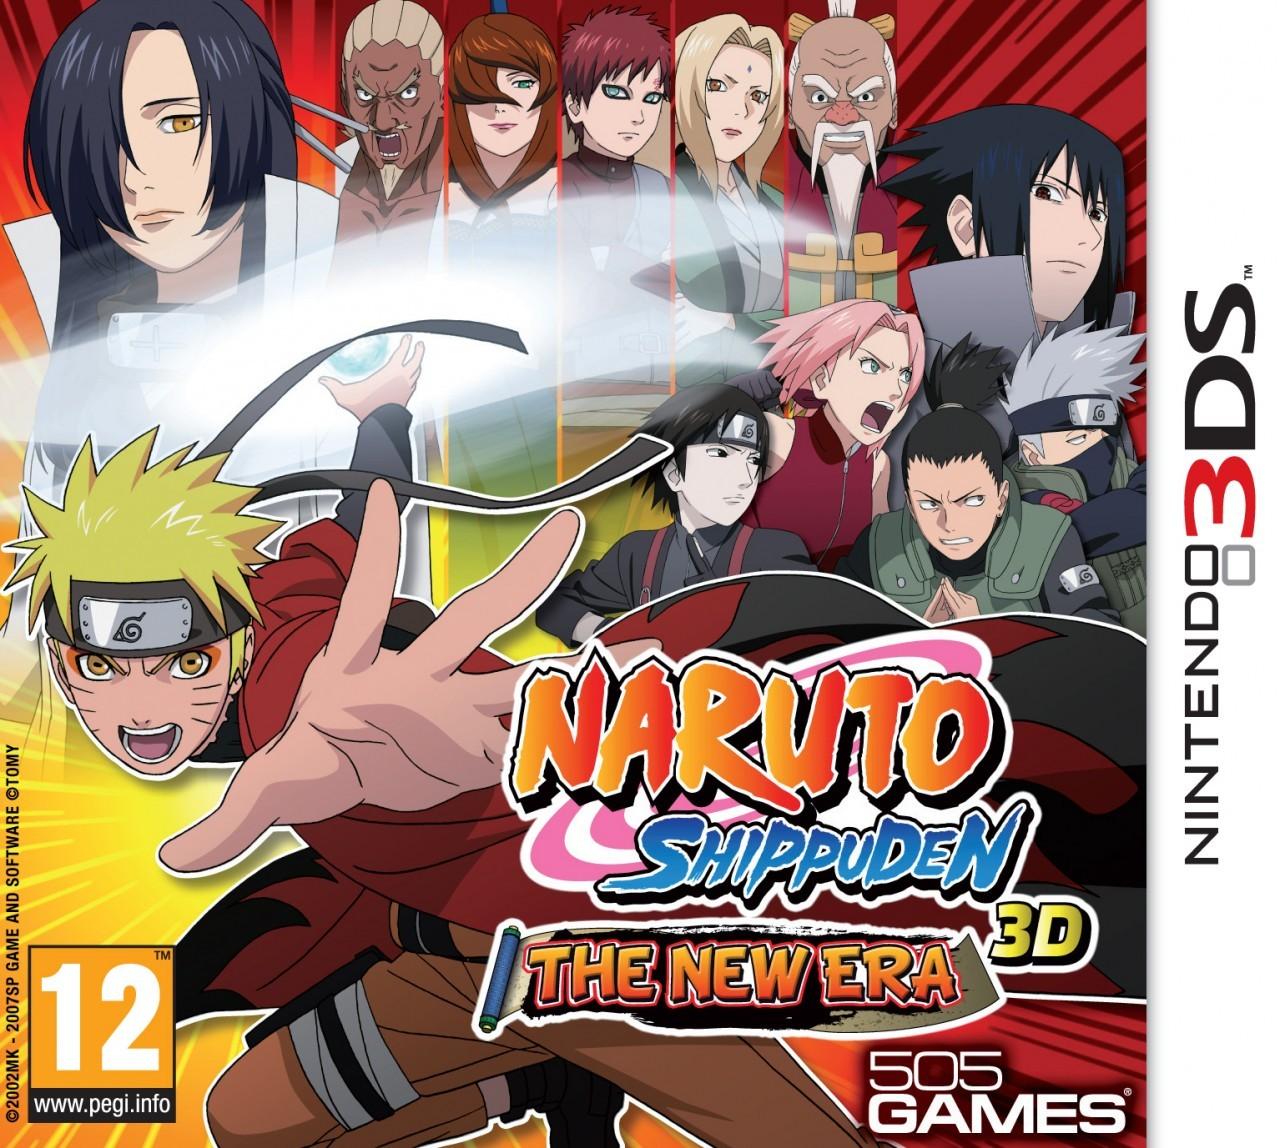 Anime News New Naruto Anime Movie Featuring Naruto S: Naruto Shippuden 3D